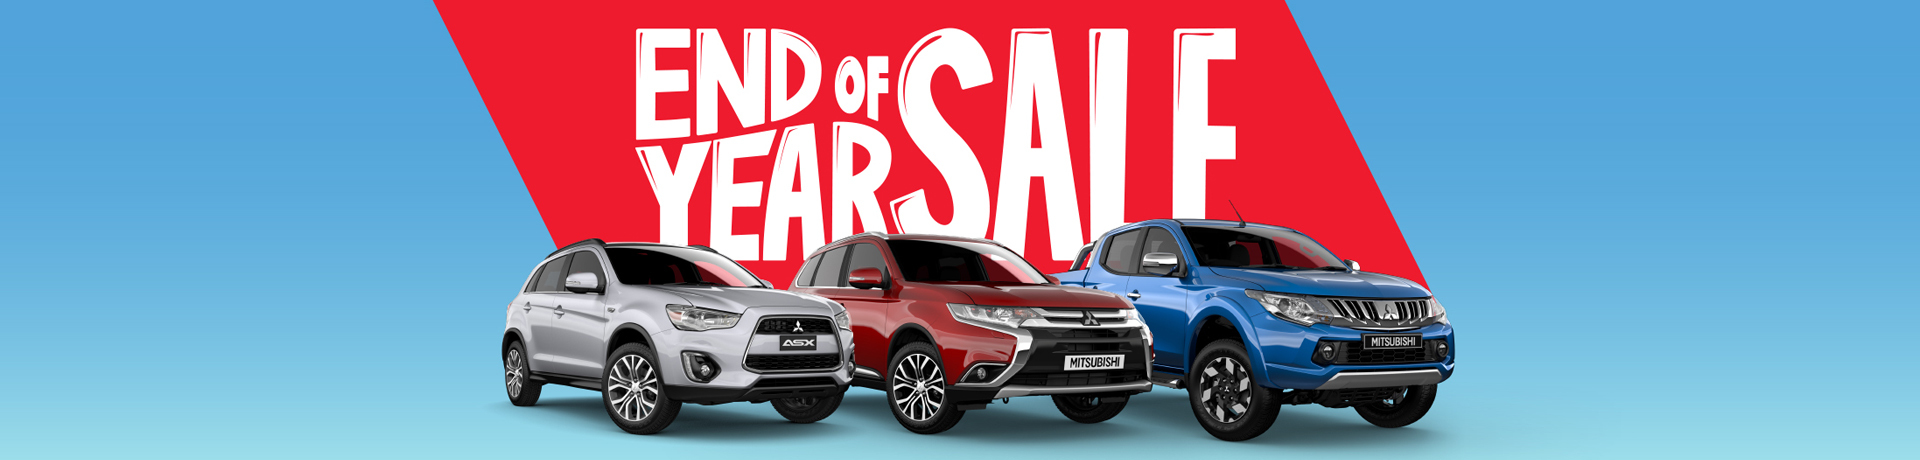 Mitsubishi End Of Year Sale